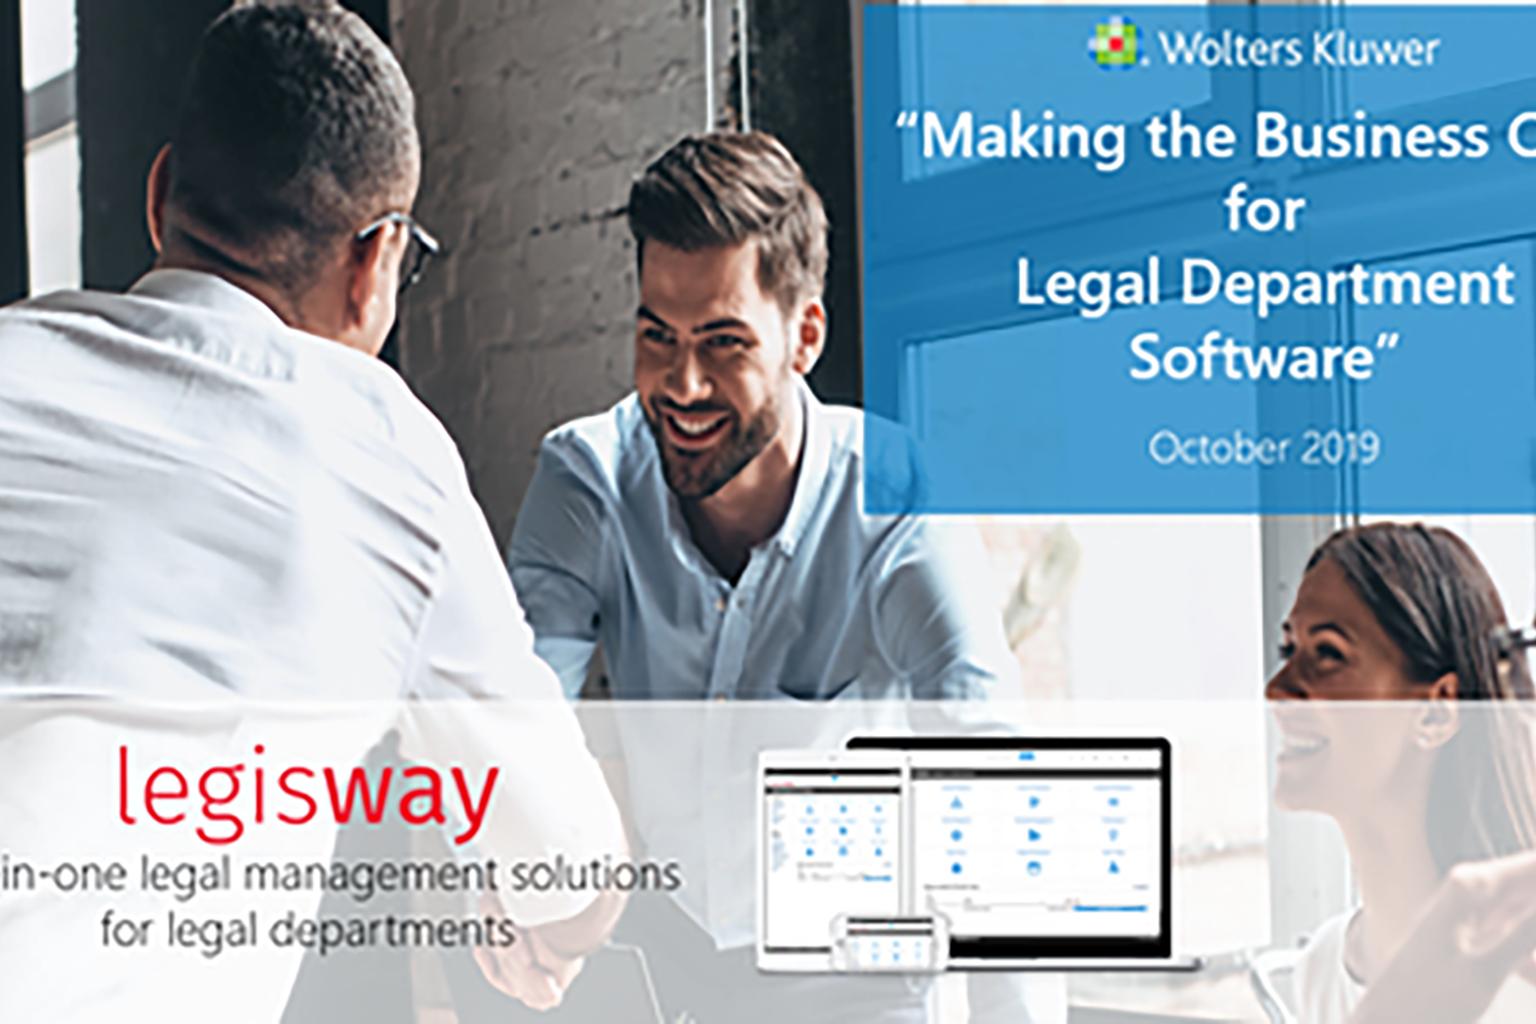 Legisway-legal department software webinar